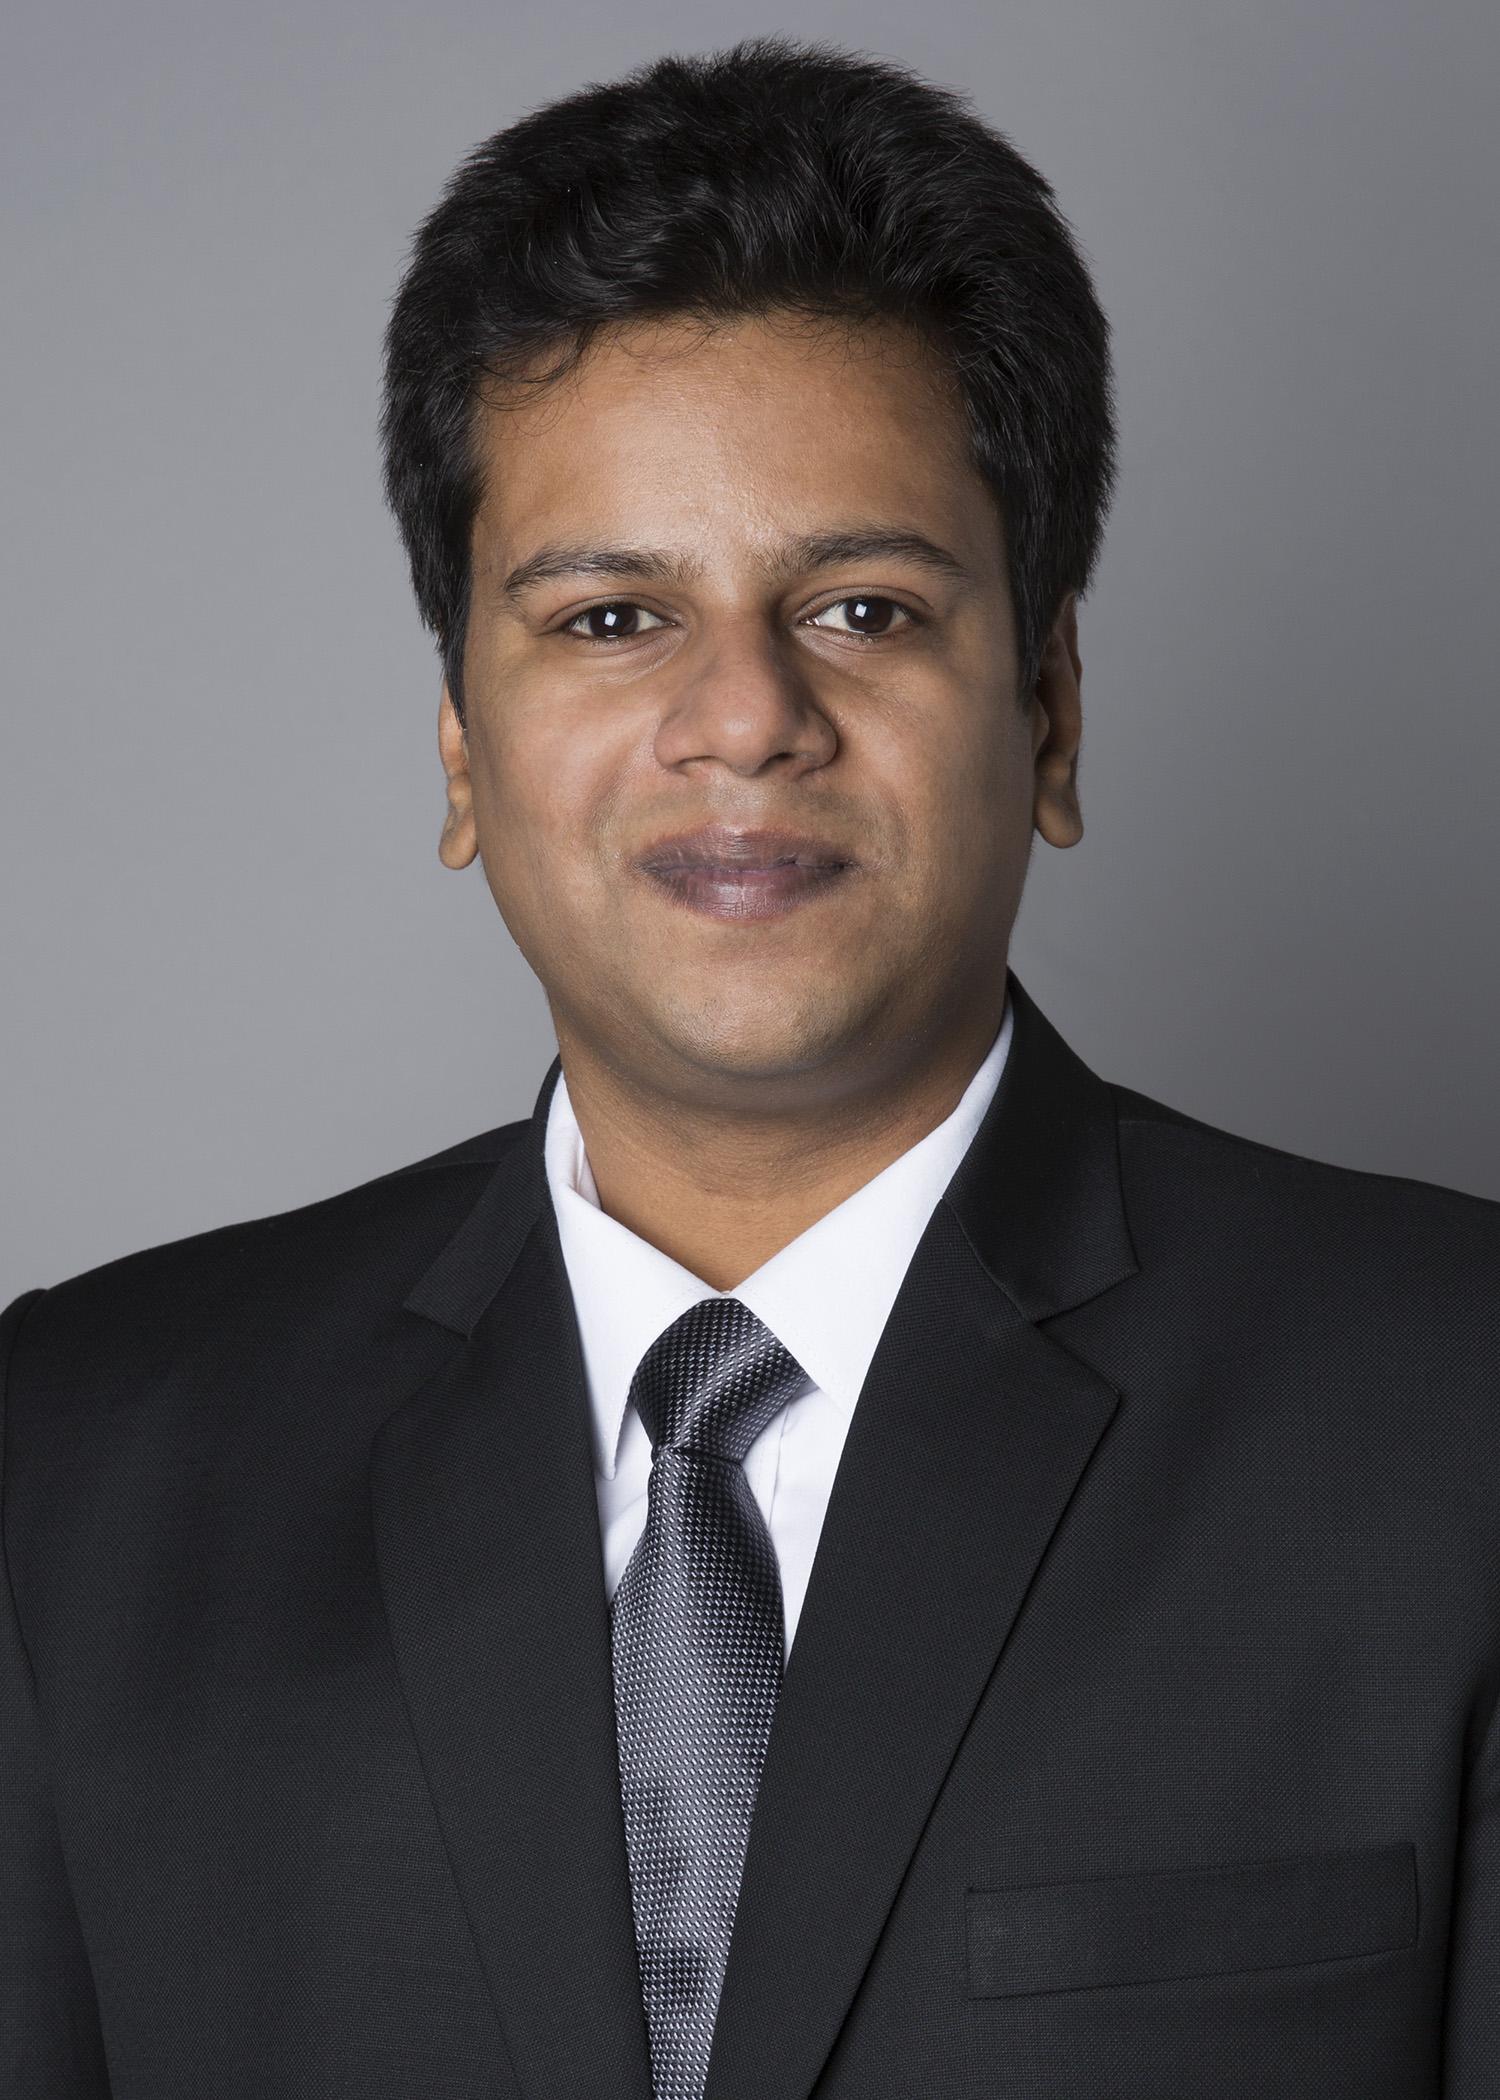 Headshot of Rahul Sharma